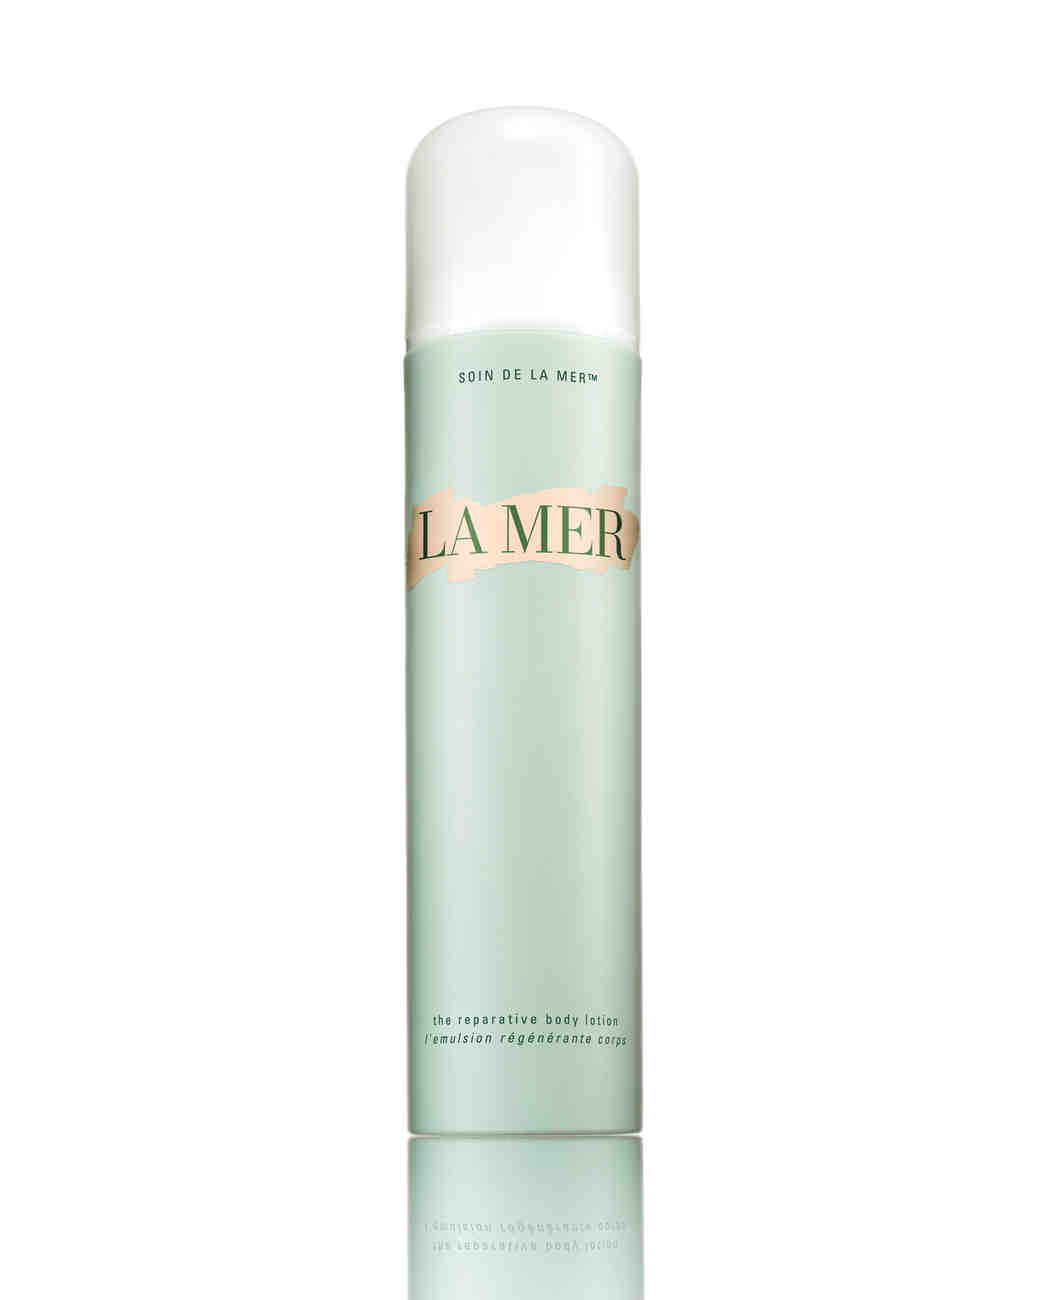 la-mer-reparative-body-lotion-0314.jpg